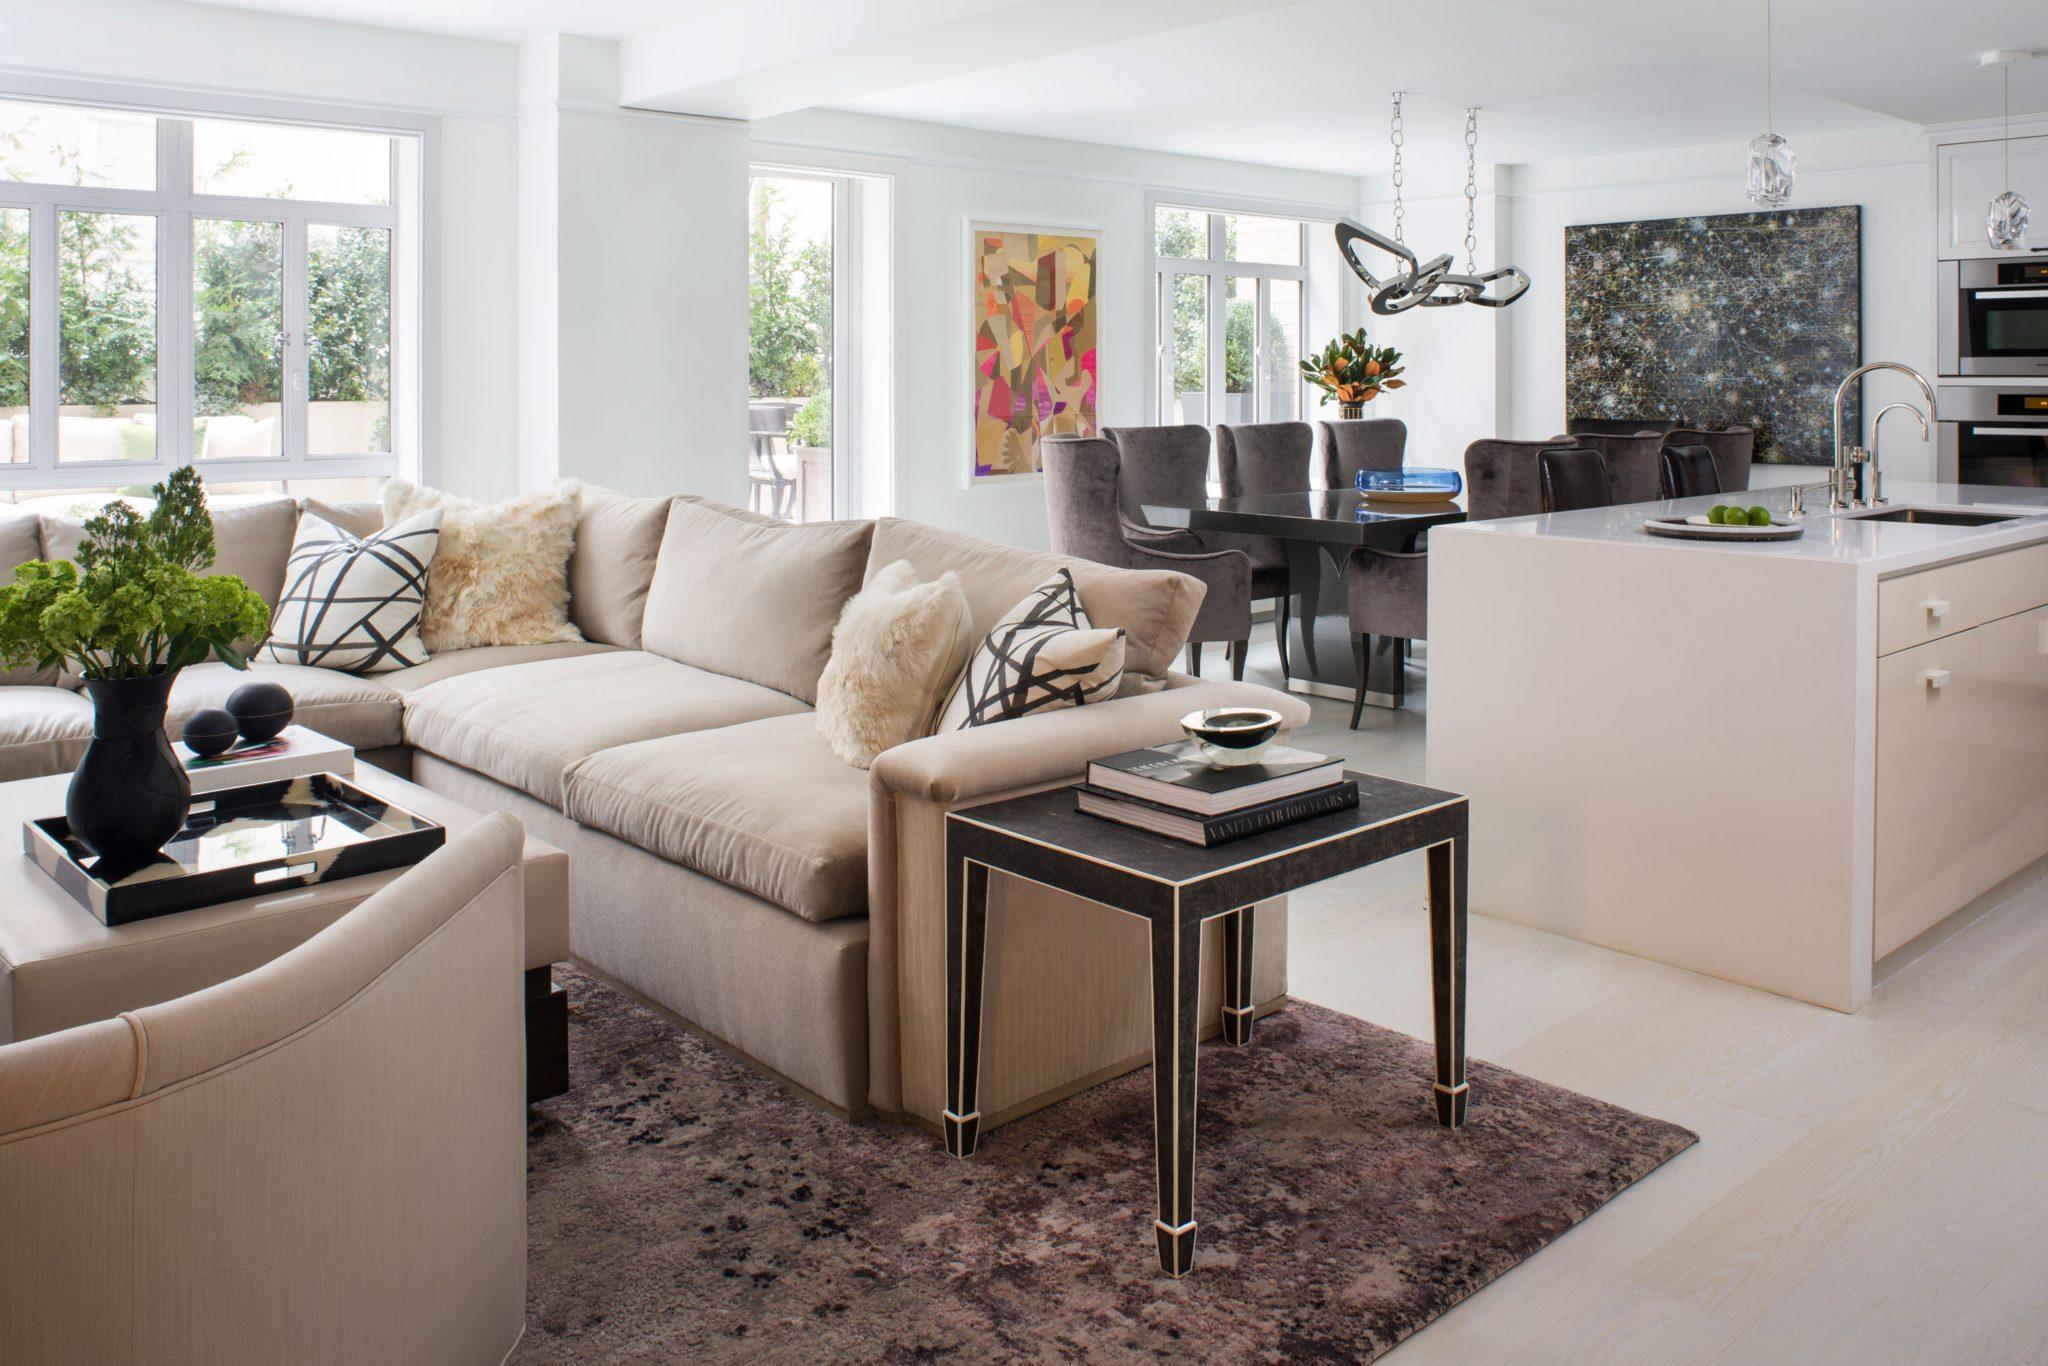 Interior design by Smith Firestone Associates